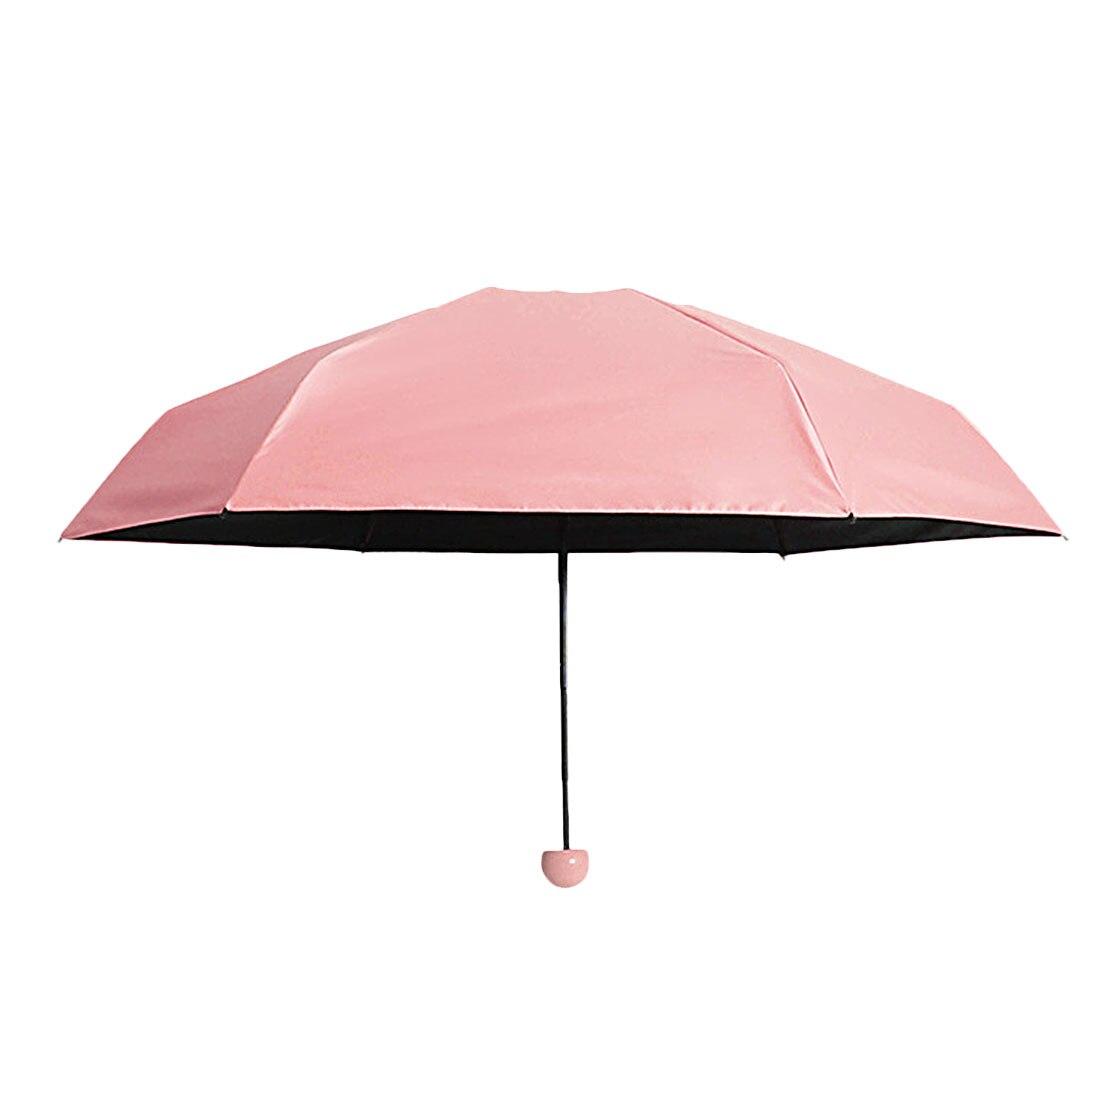 Jasne parasole advise